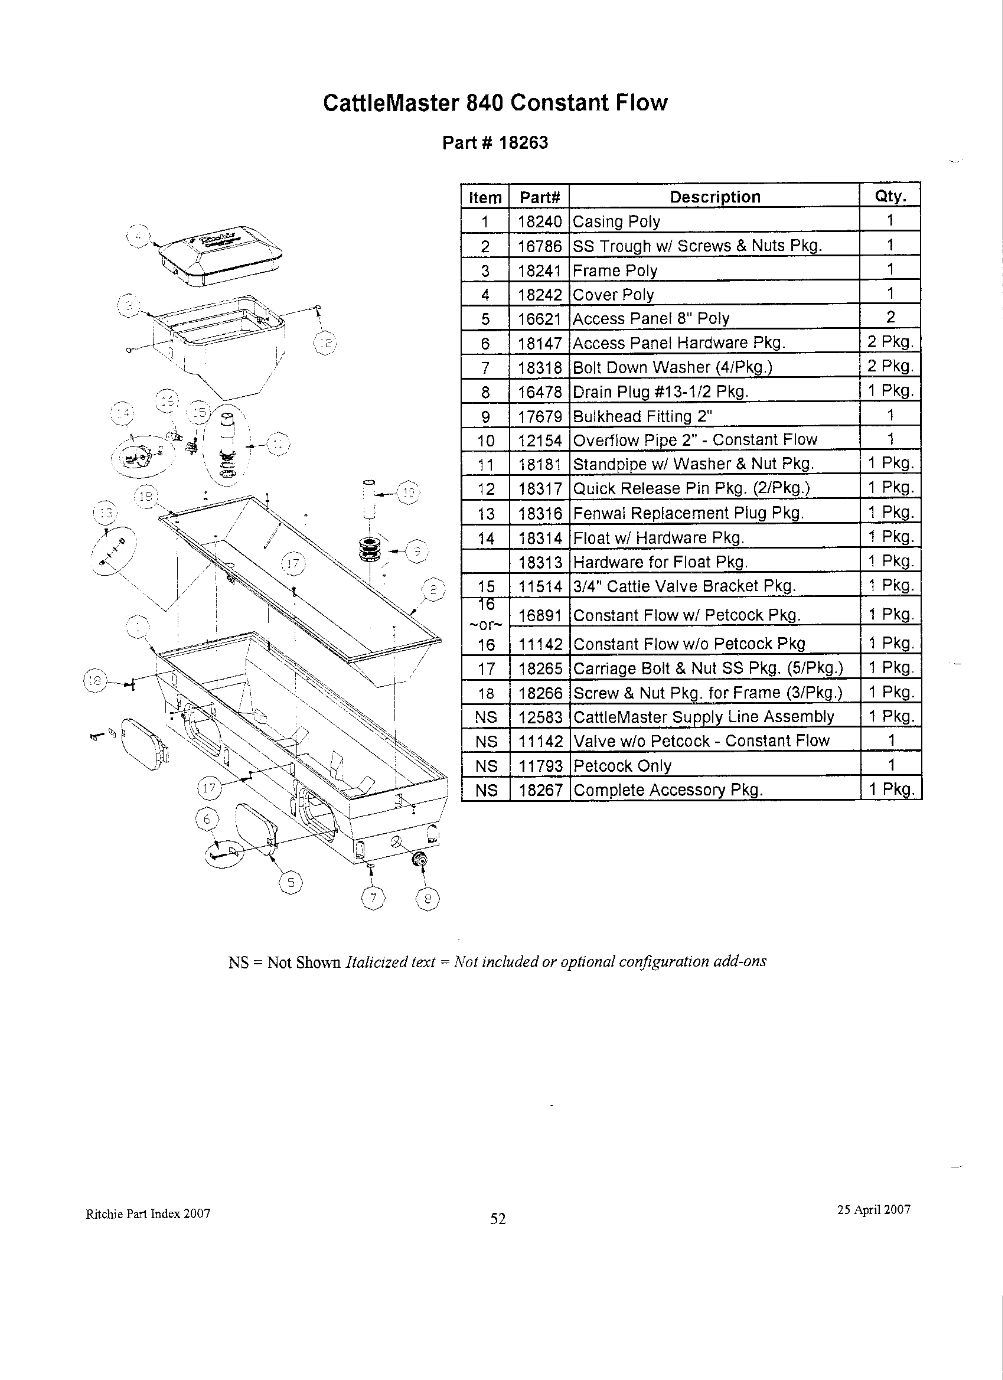 Cattlemaster 840 Constant Flow Parts